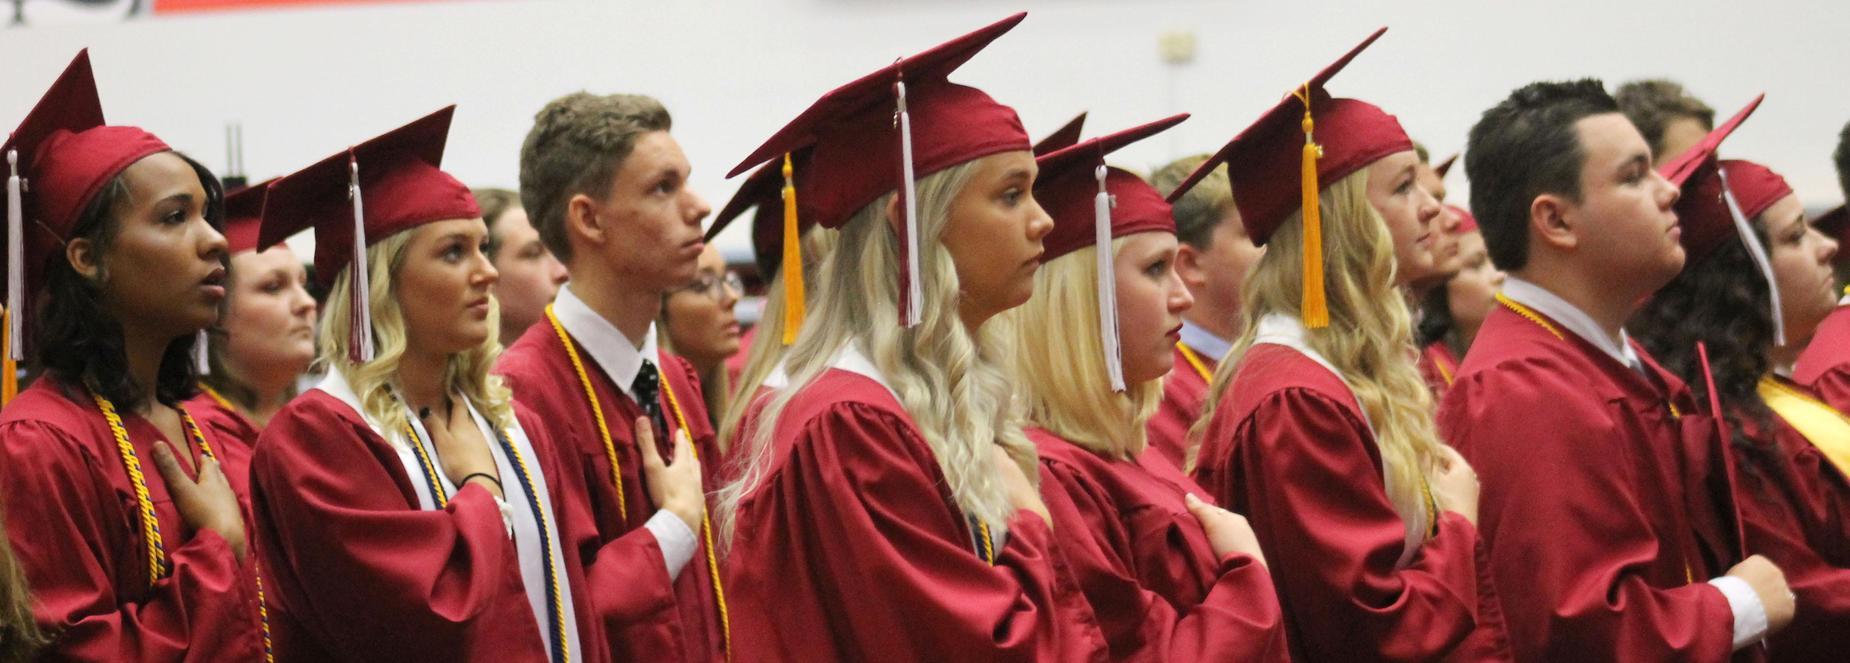 Cheatham County Central High School graduation